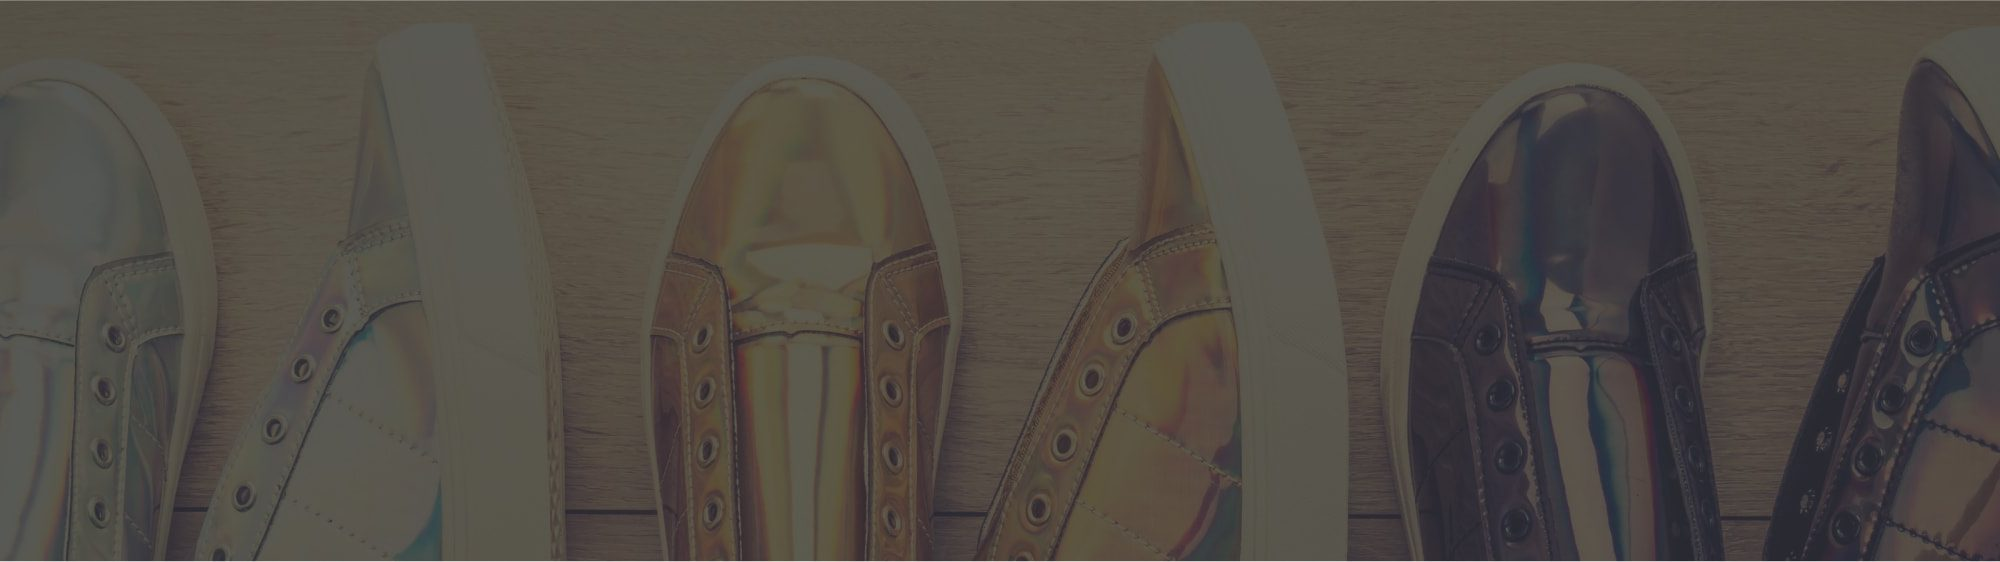 ShiekhShoes-banner-img